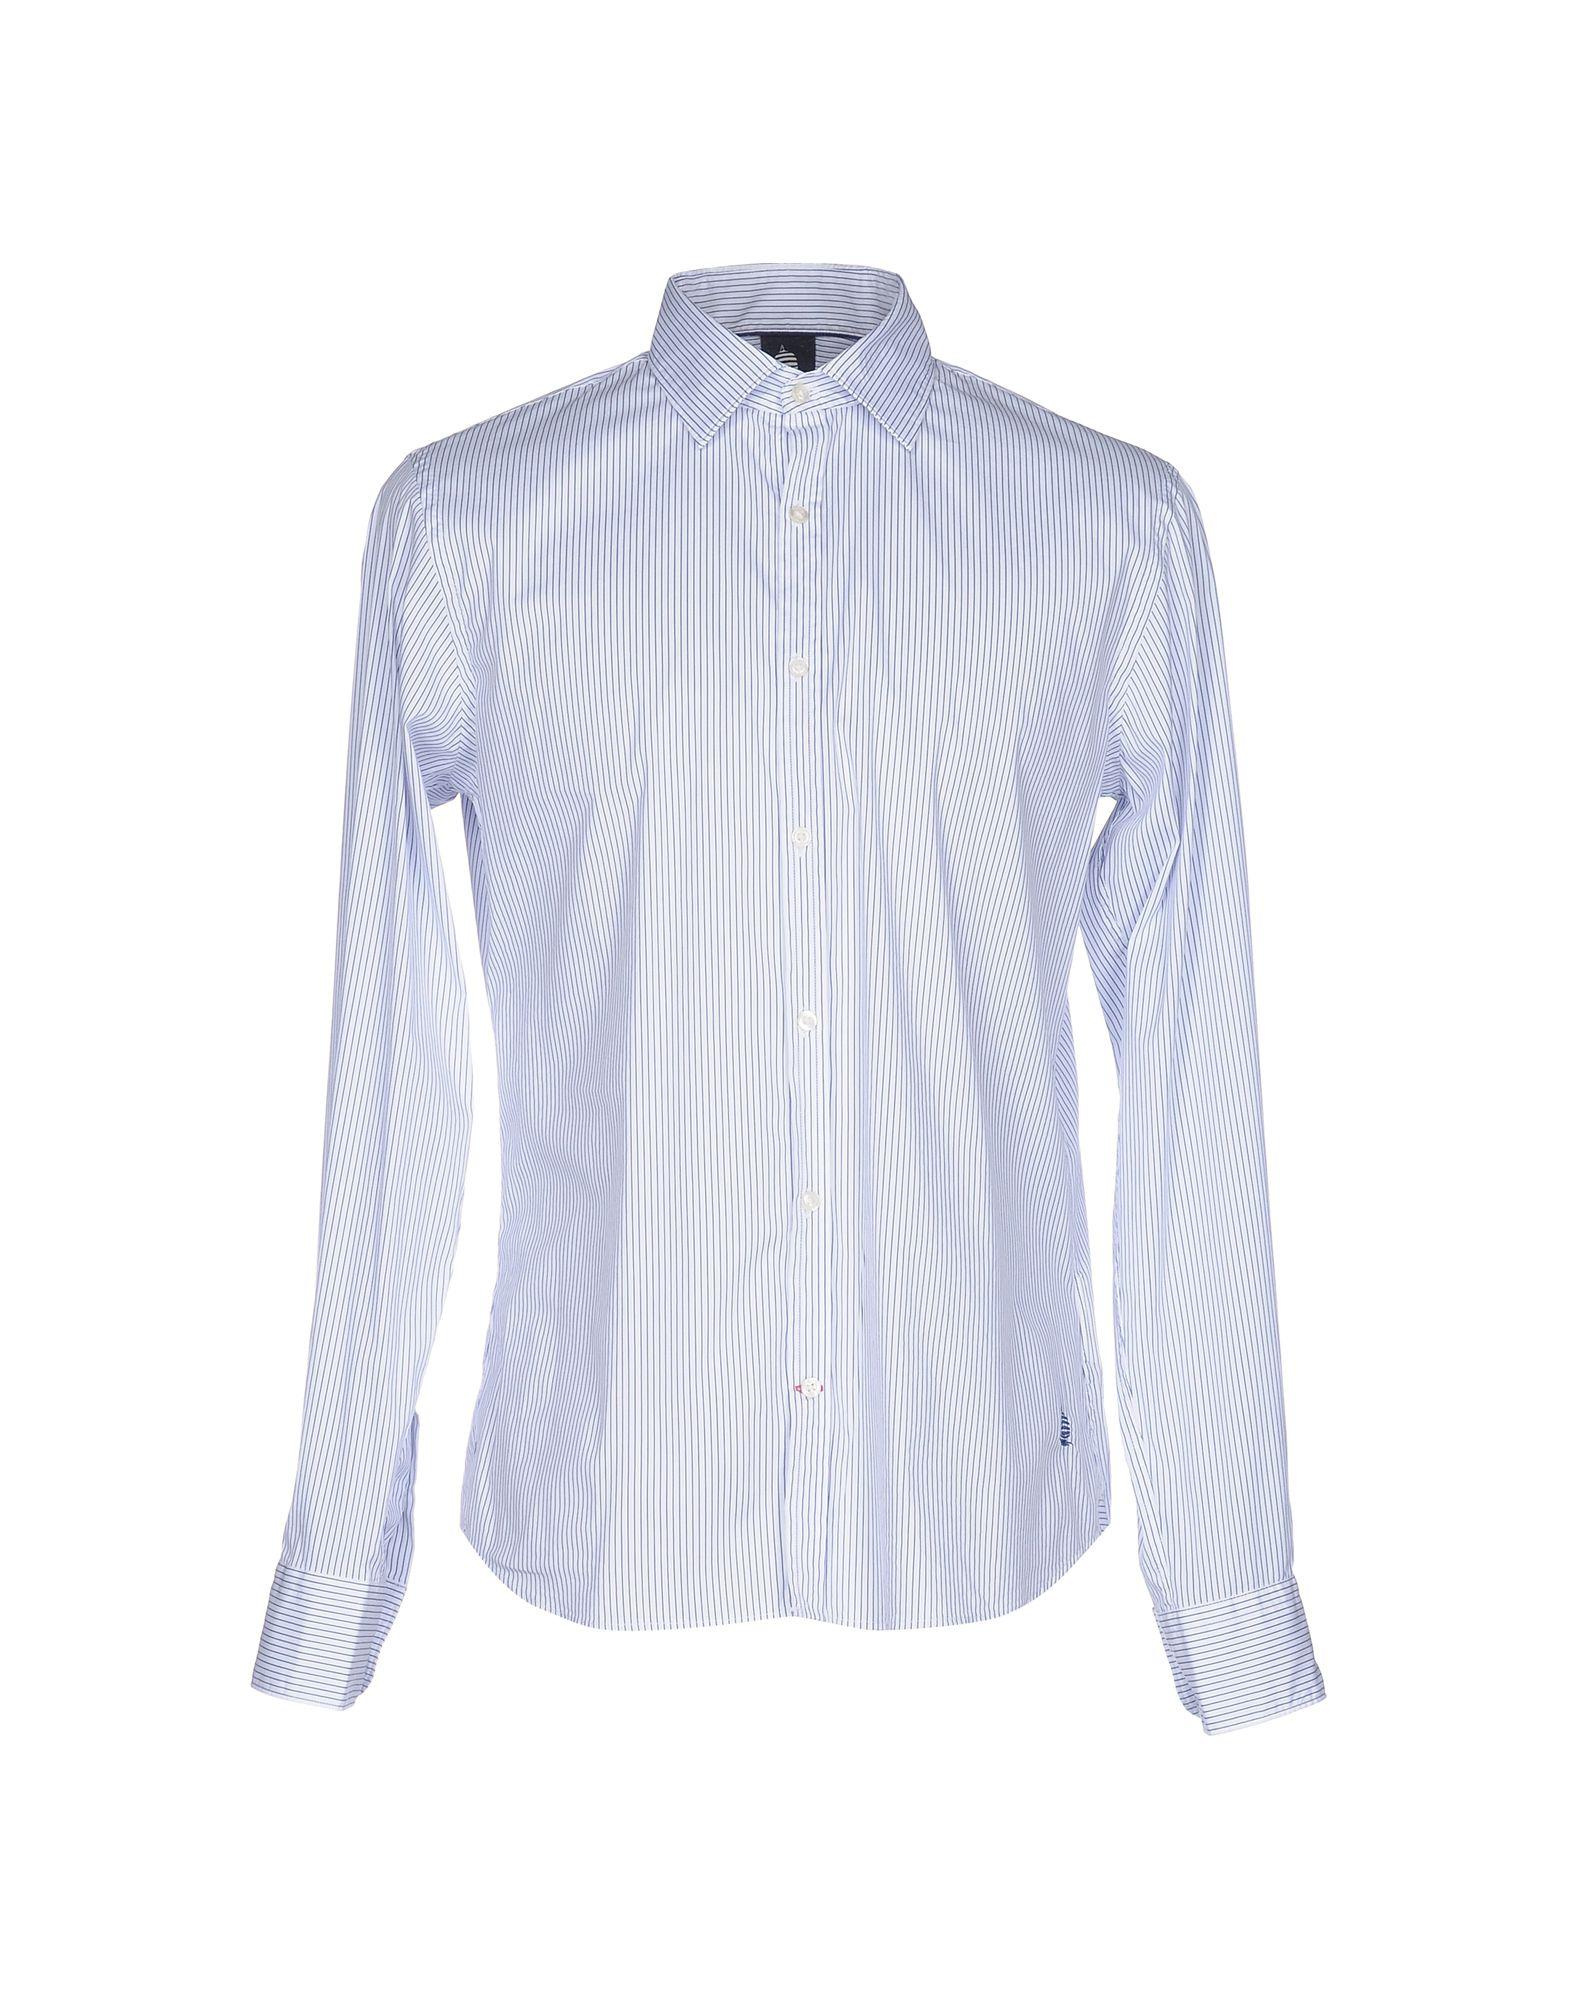 MARINA YACHTING Pубашка блуза marina yachting b1 028 58626 00 65023 092